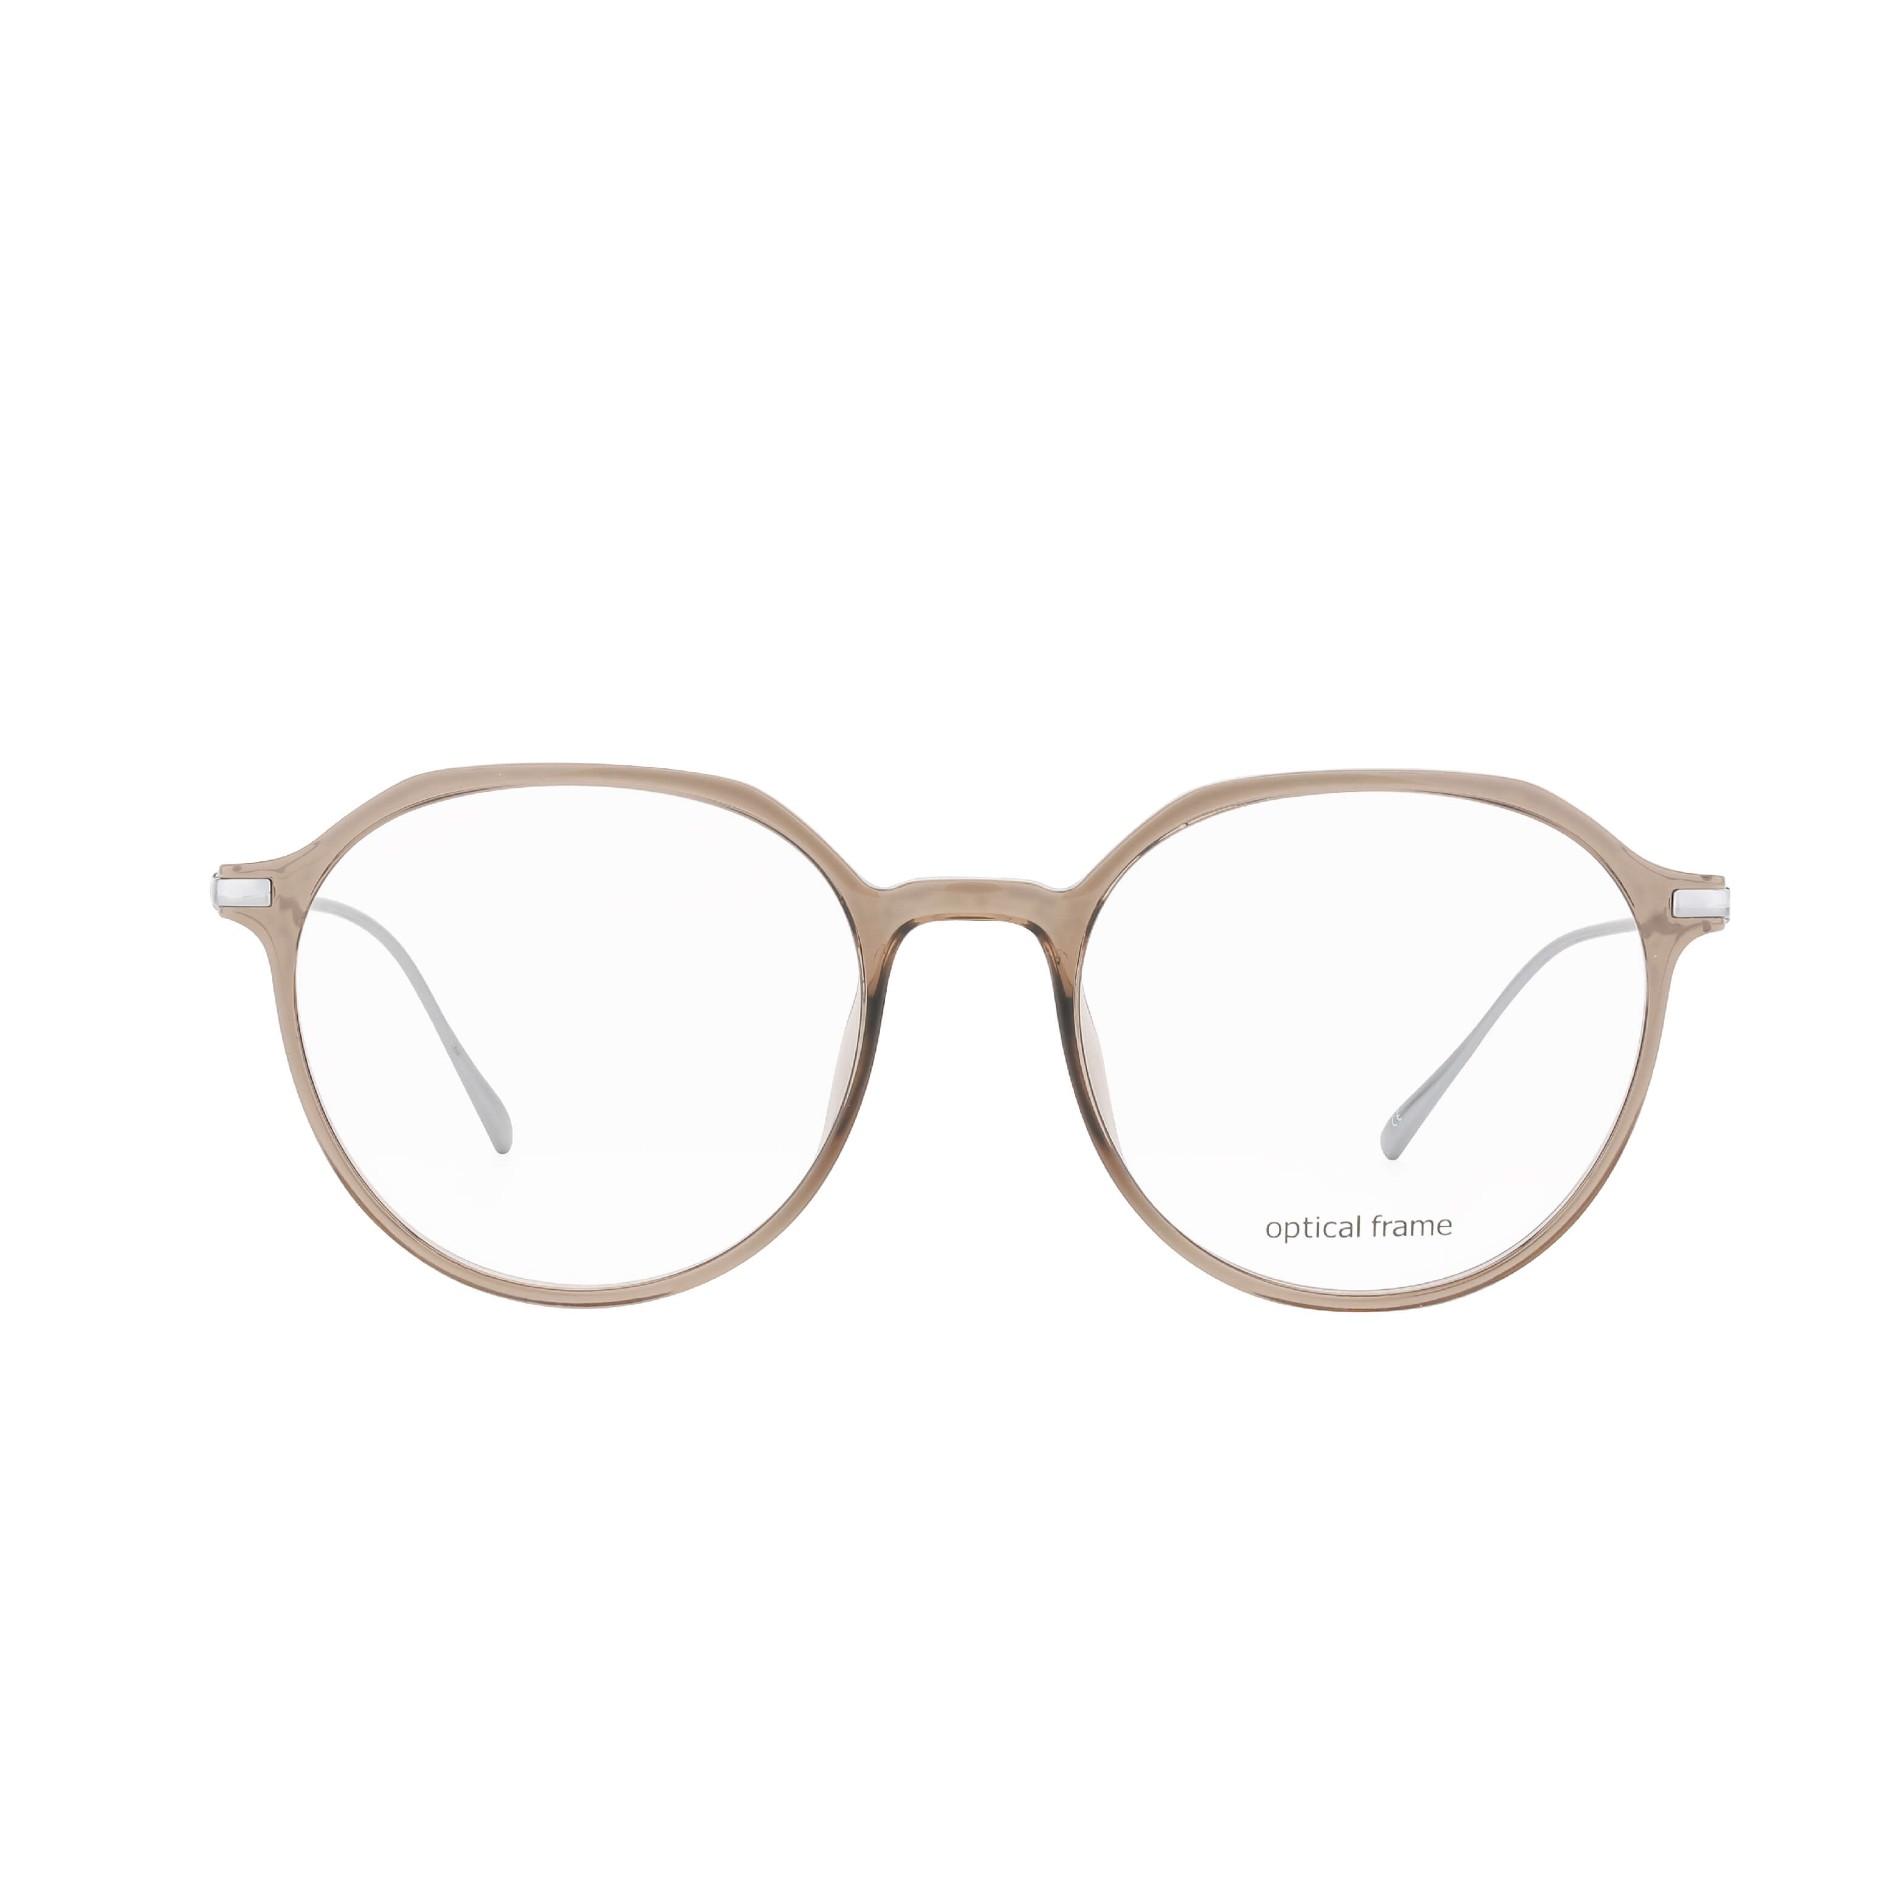 Ladies Classic Durable Grilamid Light Eyeglass Frame Manufacturers, Ladies Classic Durable Grilamid Light Eyeglass Frame Factory, Supply Ladies Classic Durable Grilamid Light Eyeglass Frame